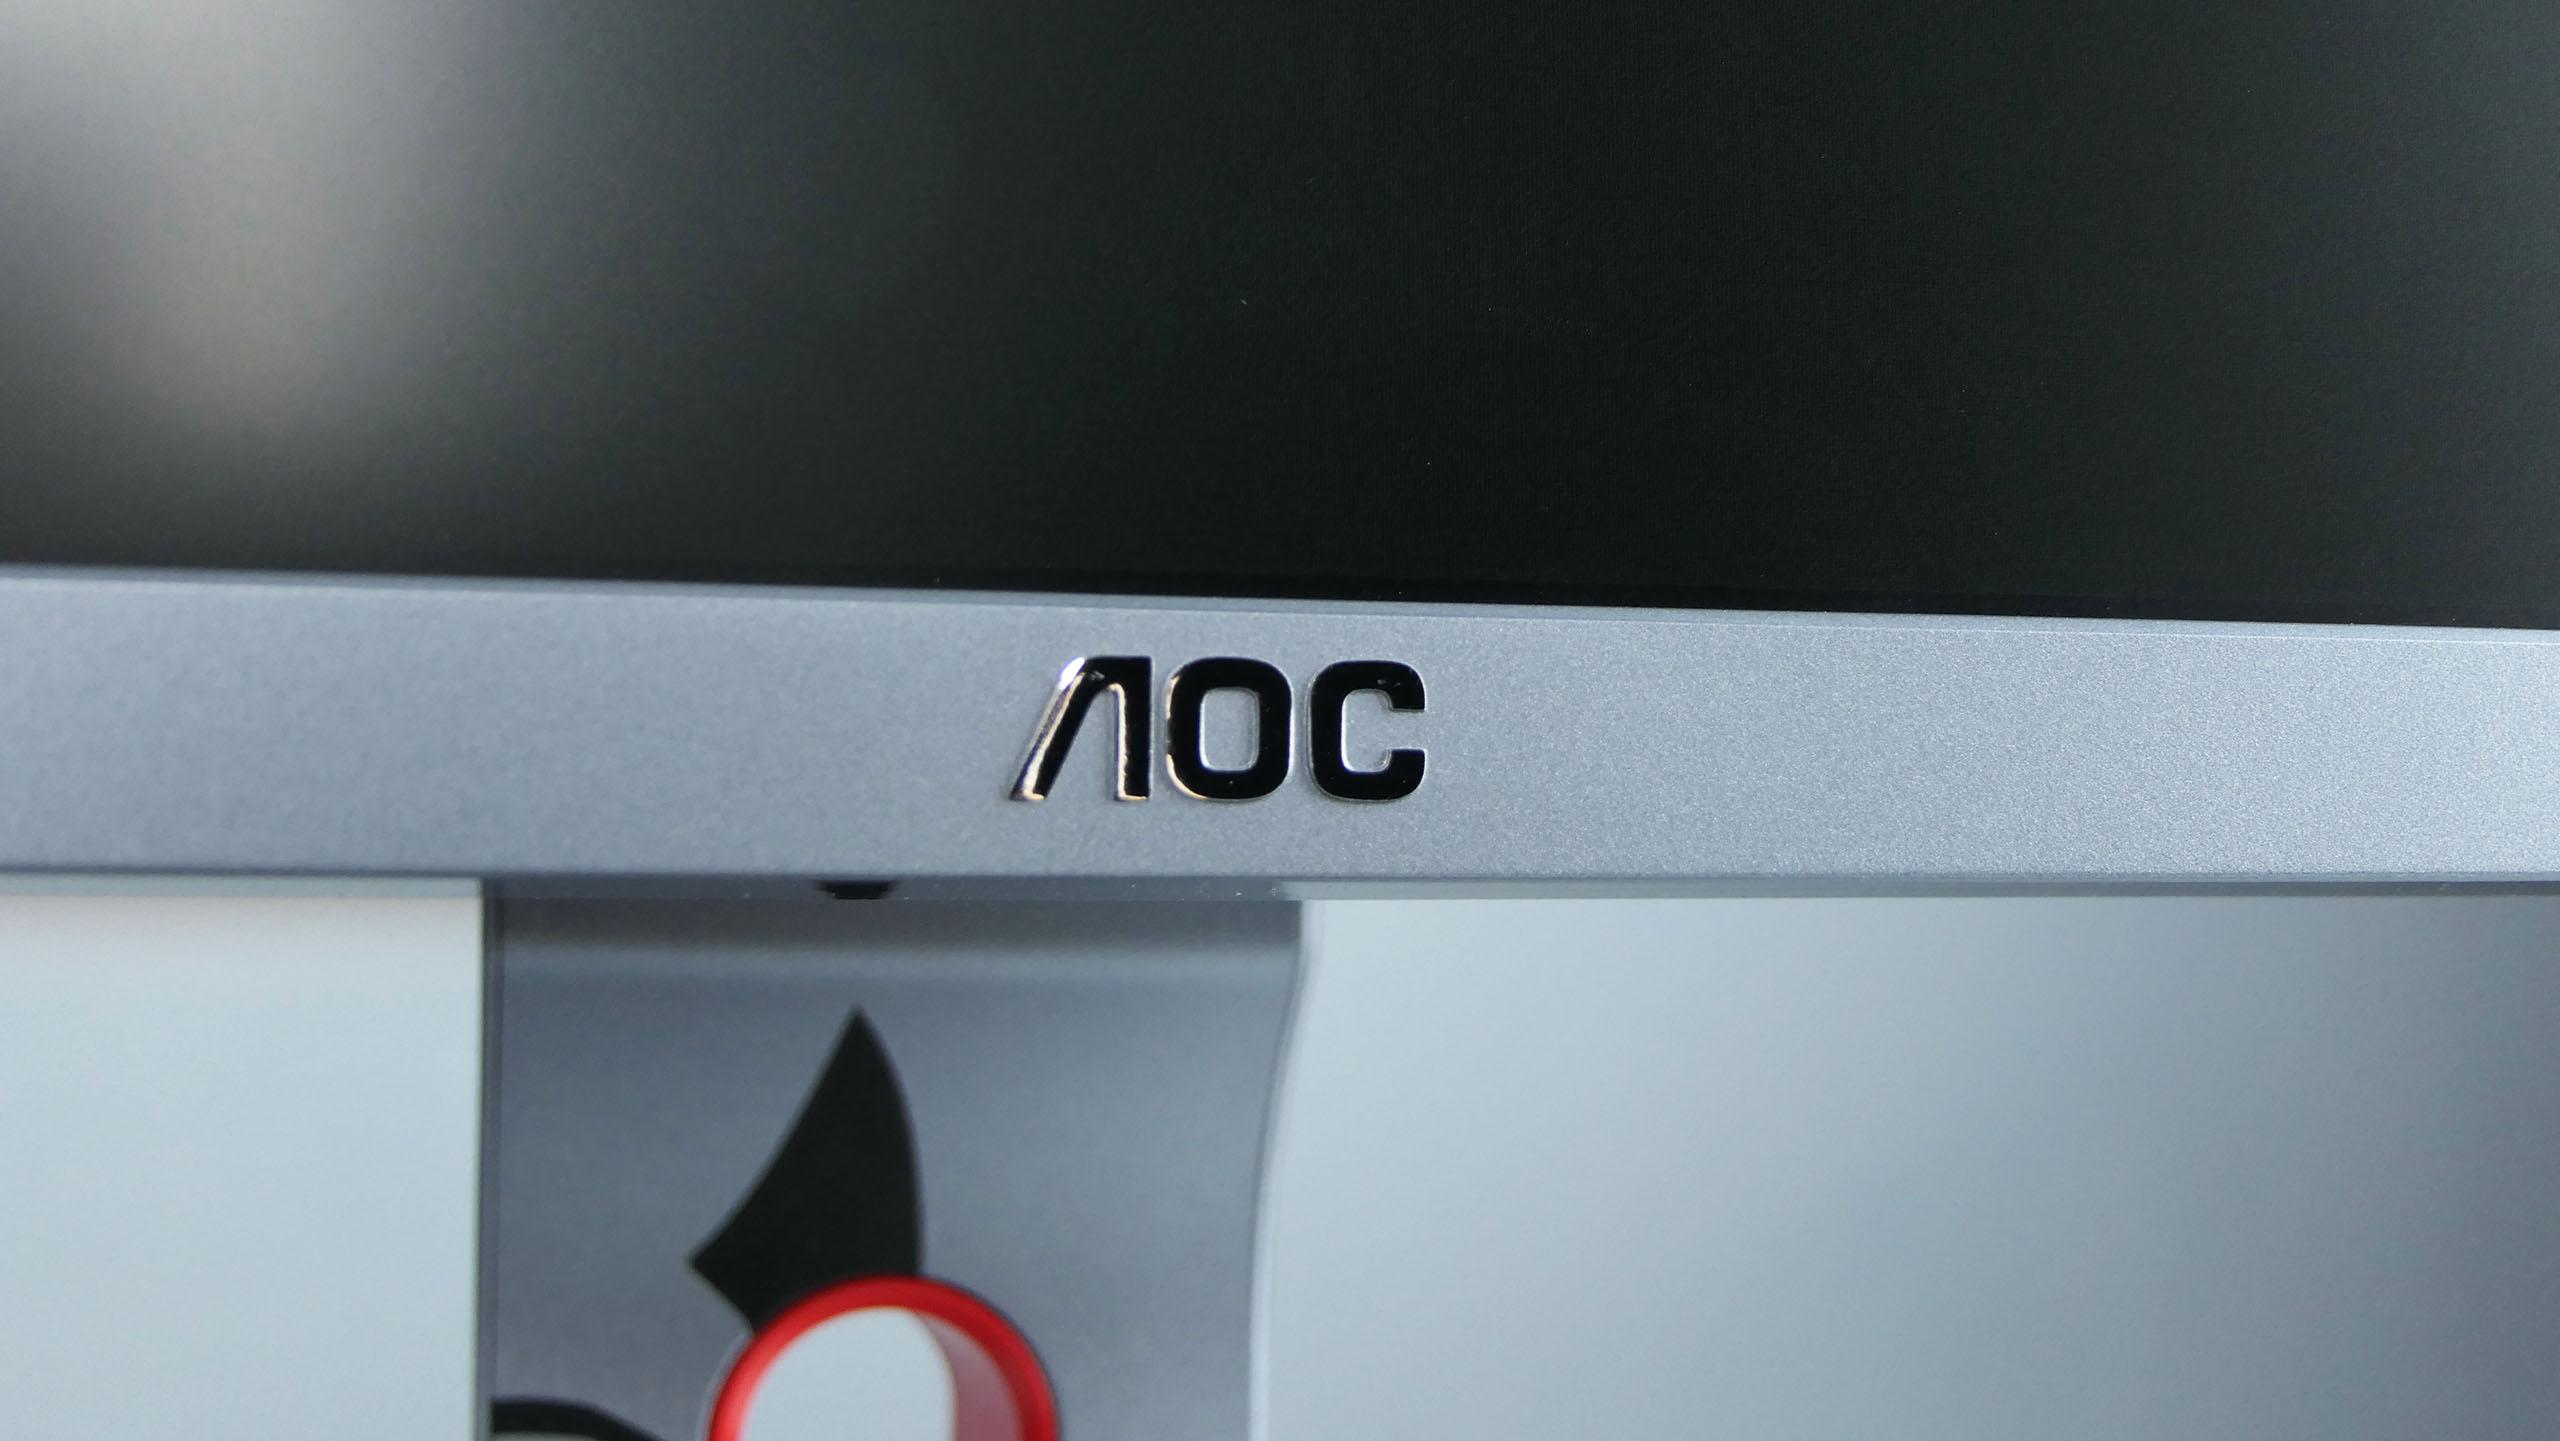 AOC G2590PX G2